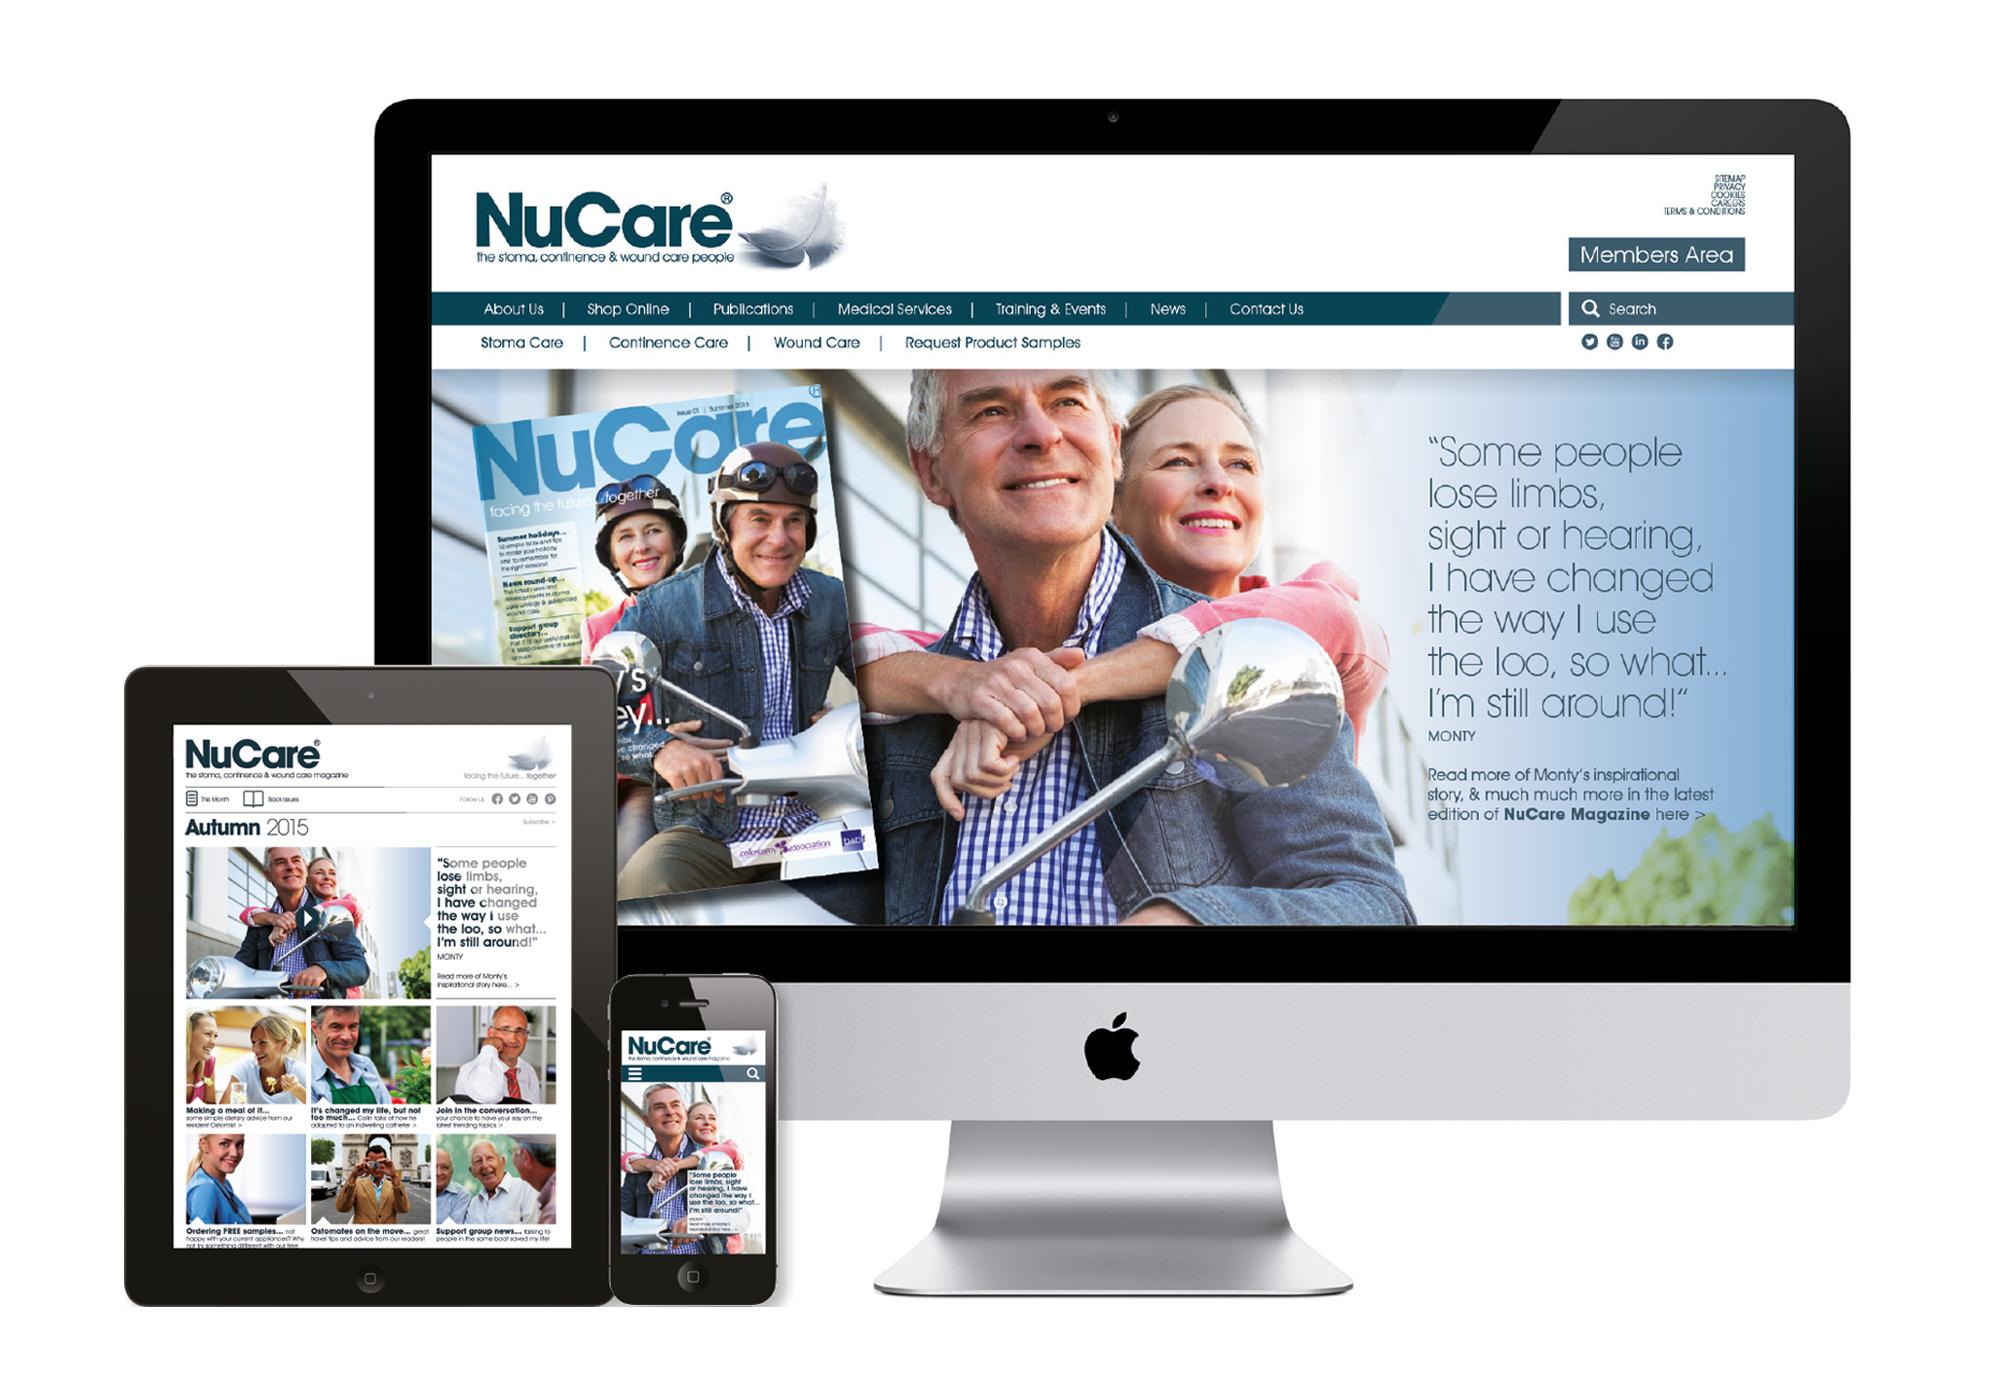 NuCare website design on desktop